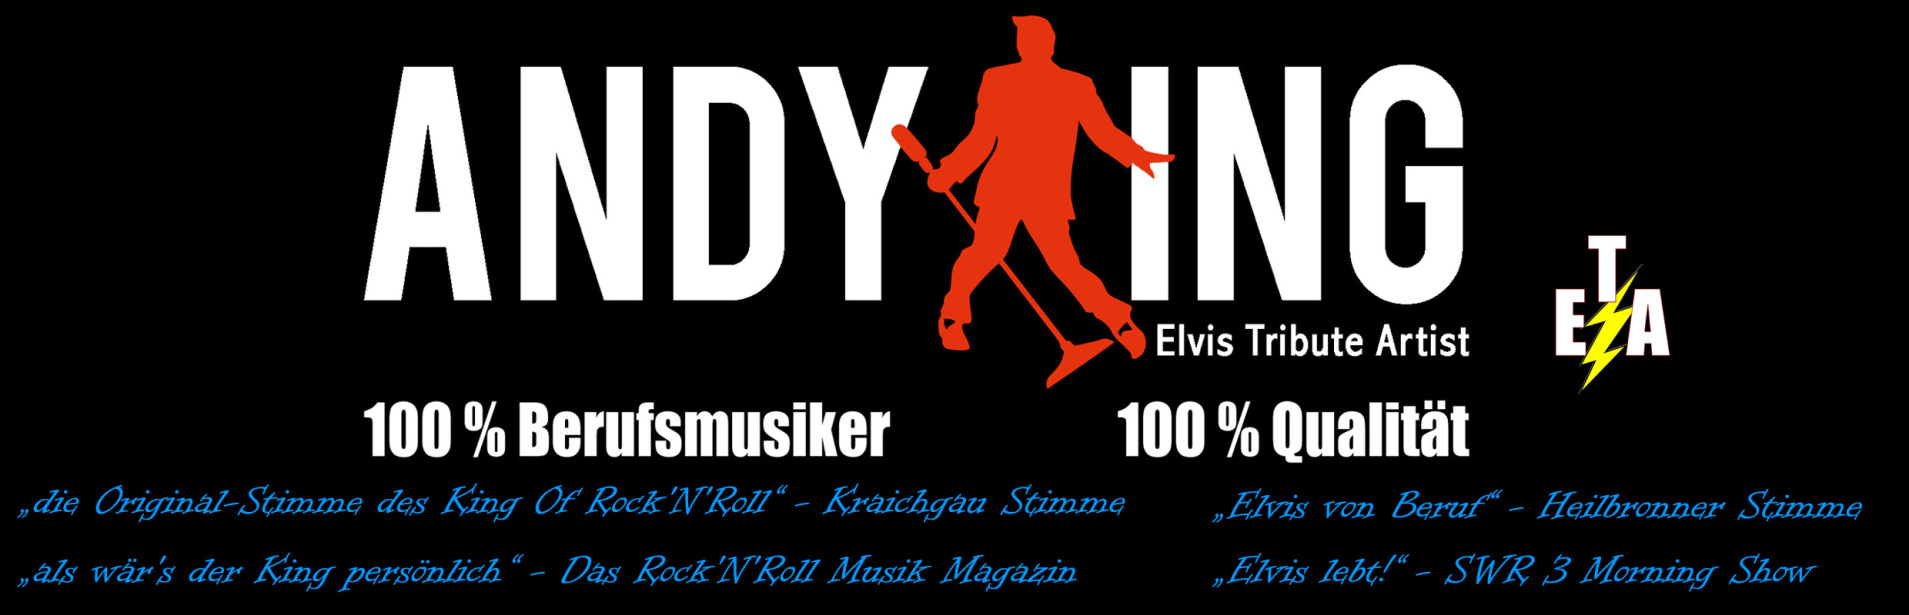 Andy King Elvis Tribute Artist 2018